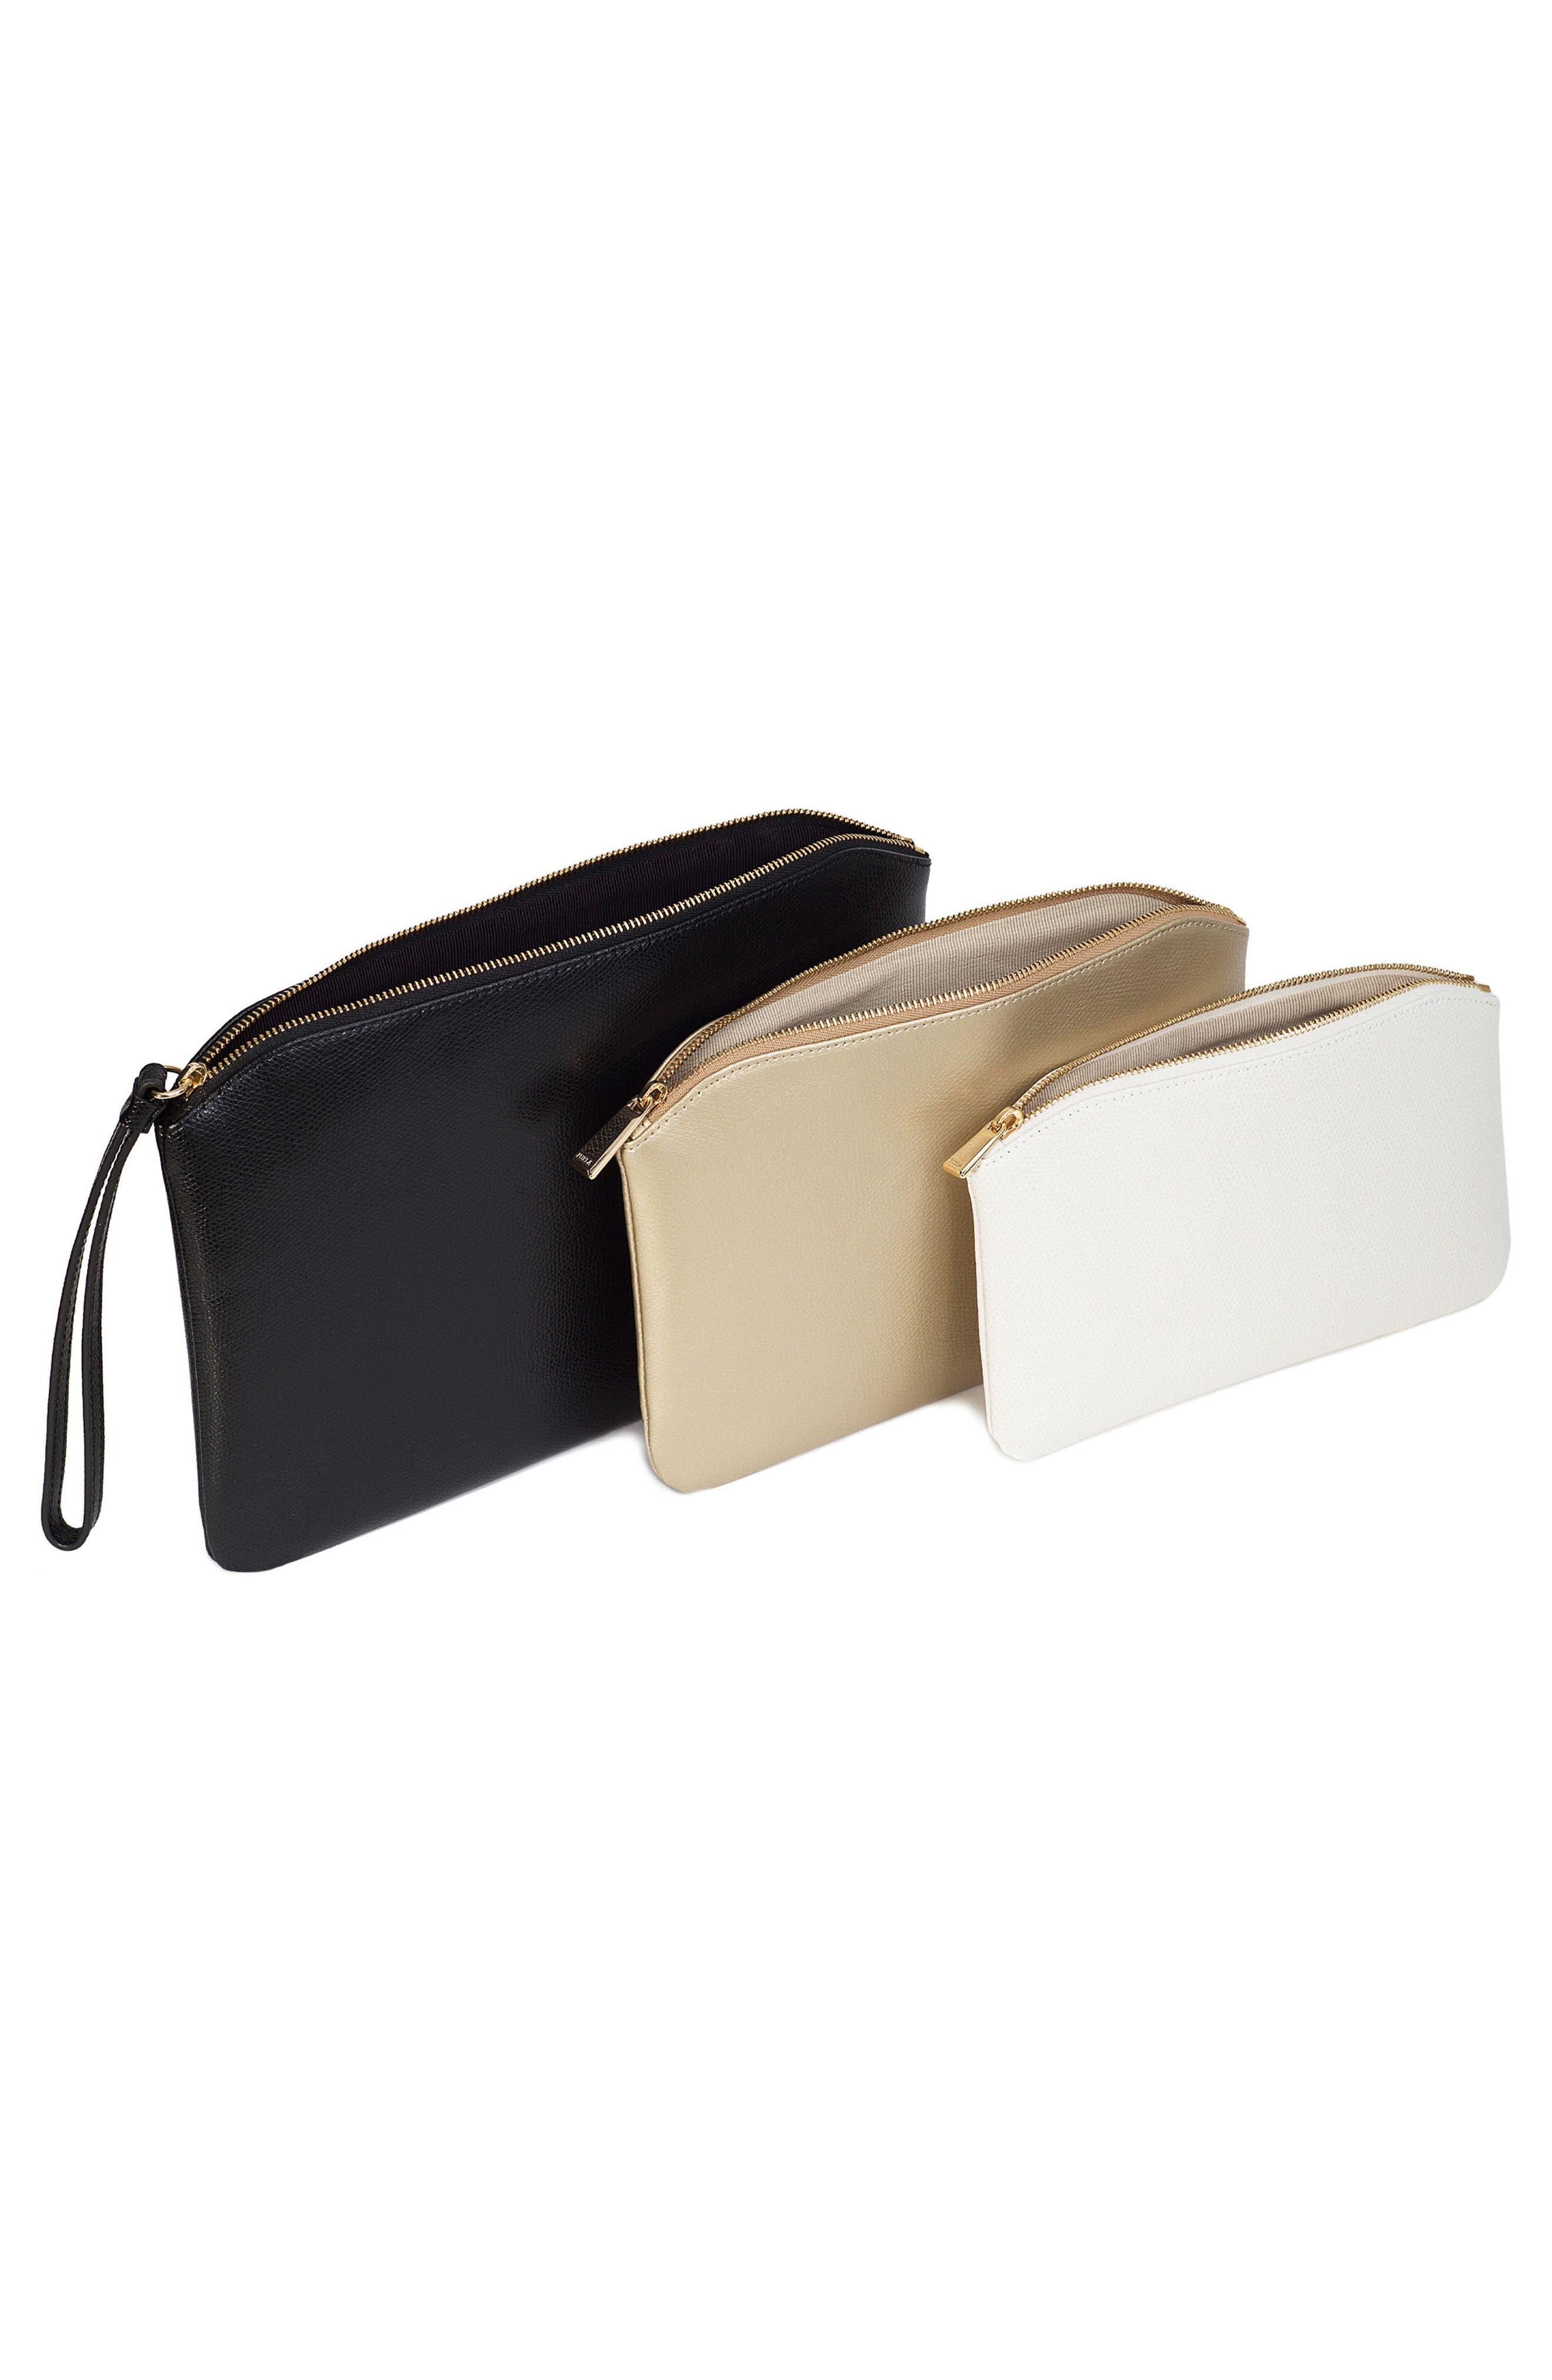 Venere Set of 3 Leather Cosmetic Bags,                             Alternate thumbnail 2, color,                             Onyx/ Gold/ Petalo